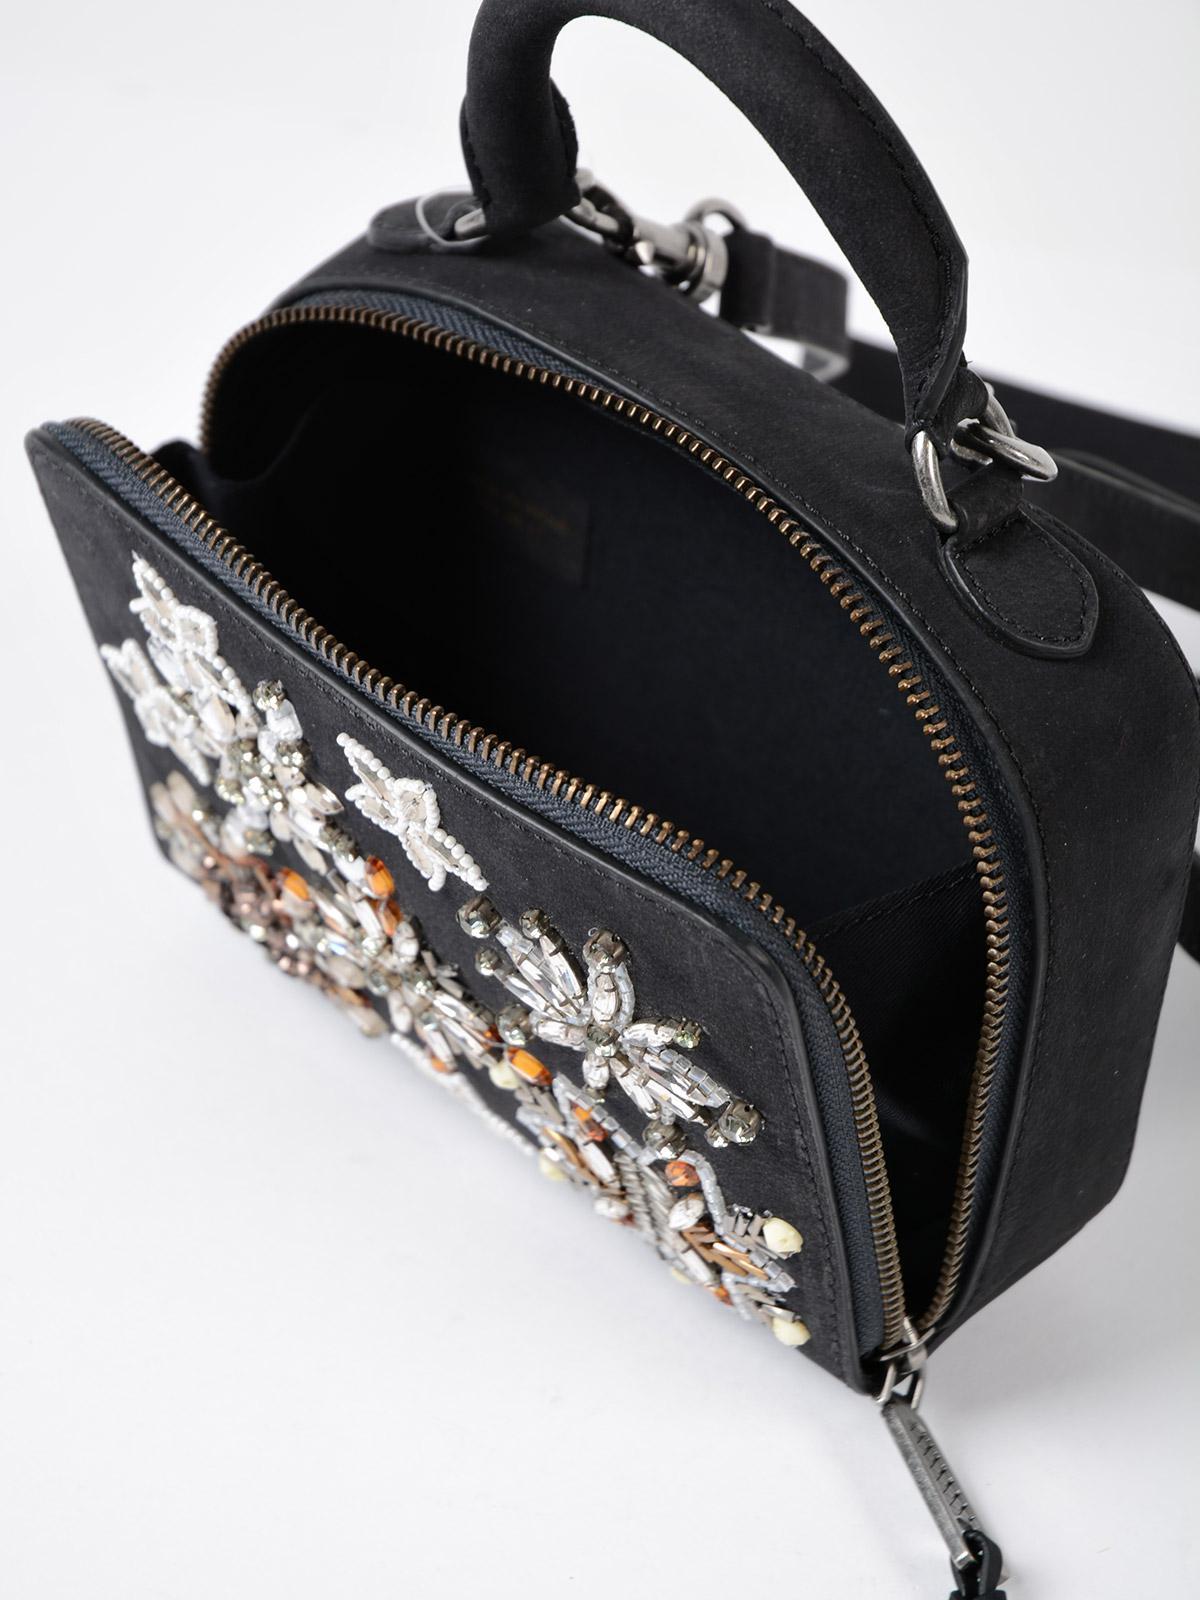 Rebecca Minkoff Leather Women's Box Nubuck Cross Body Bag in Black